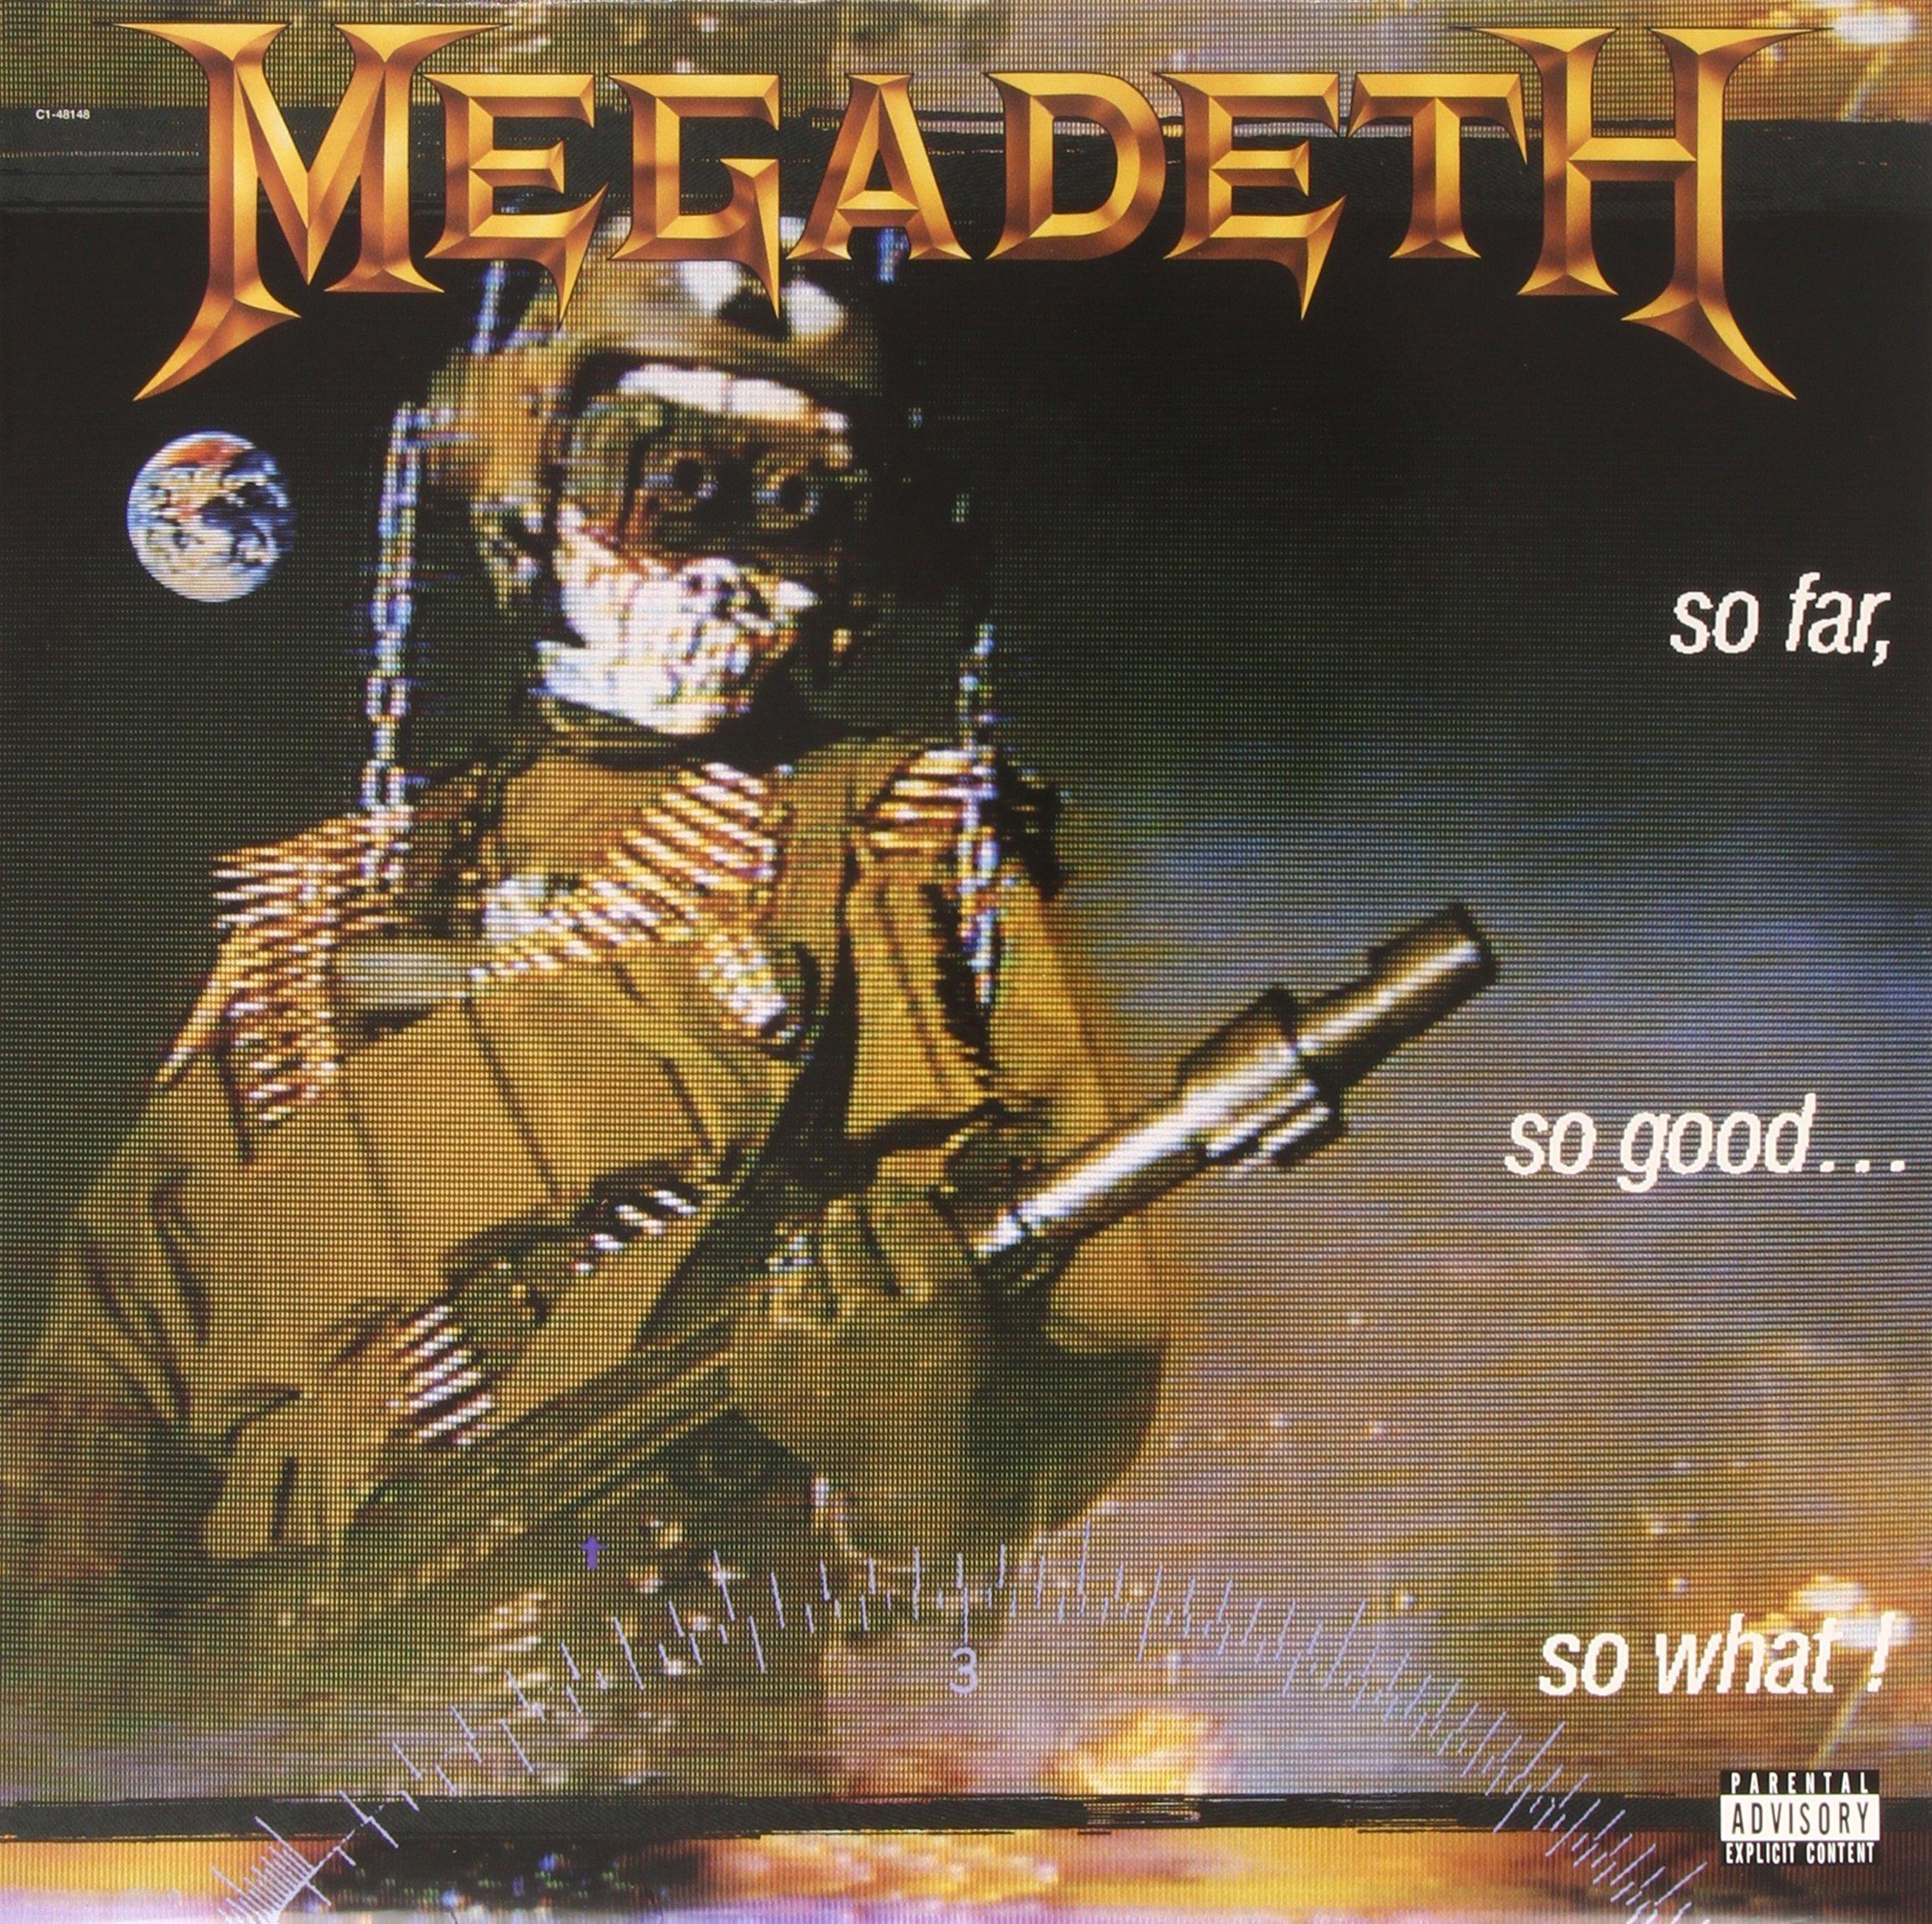 So Far, So Good, So What [Vinyl]